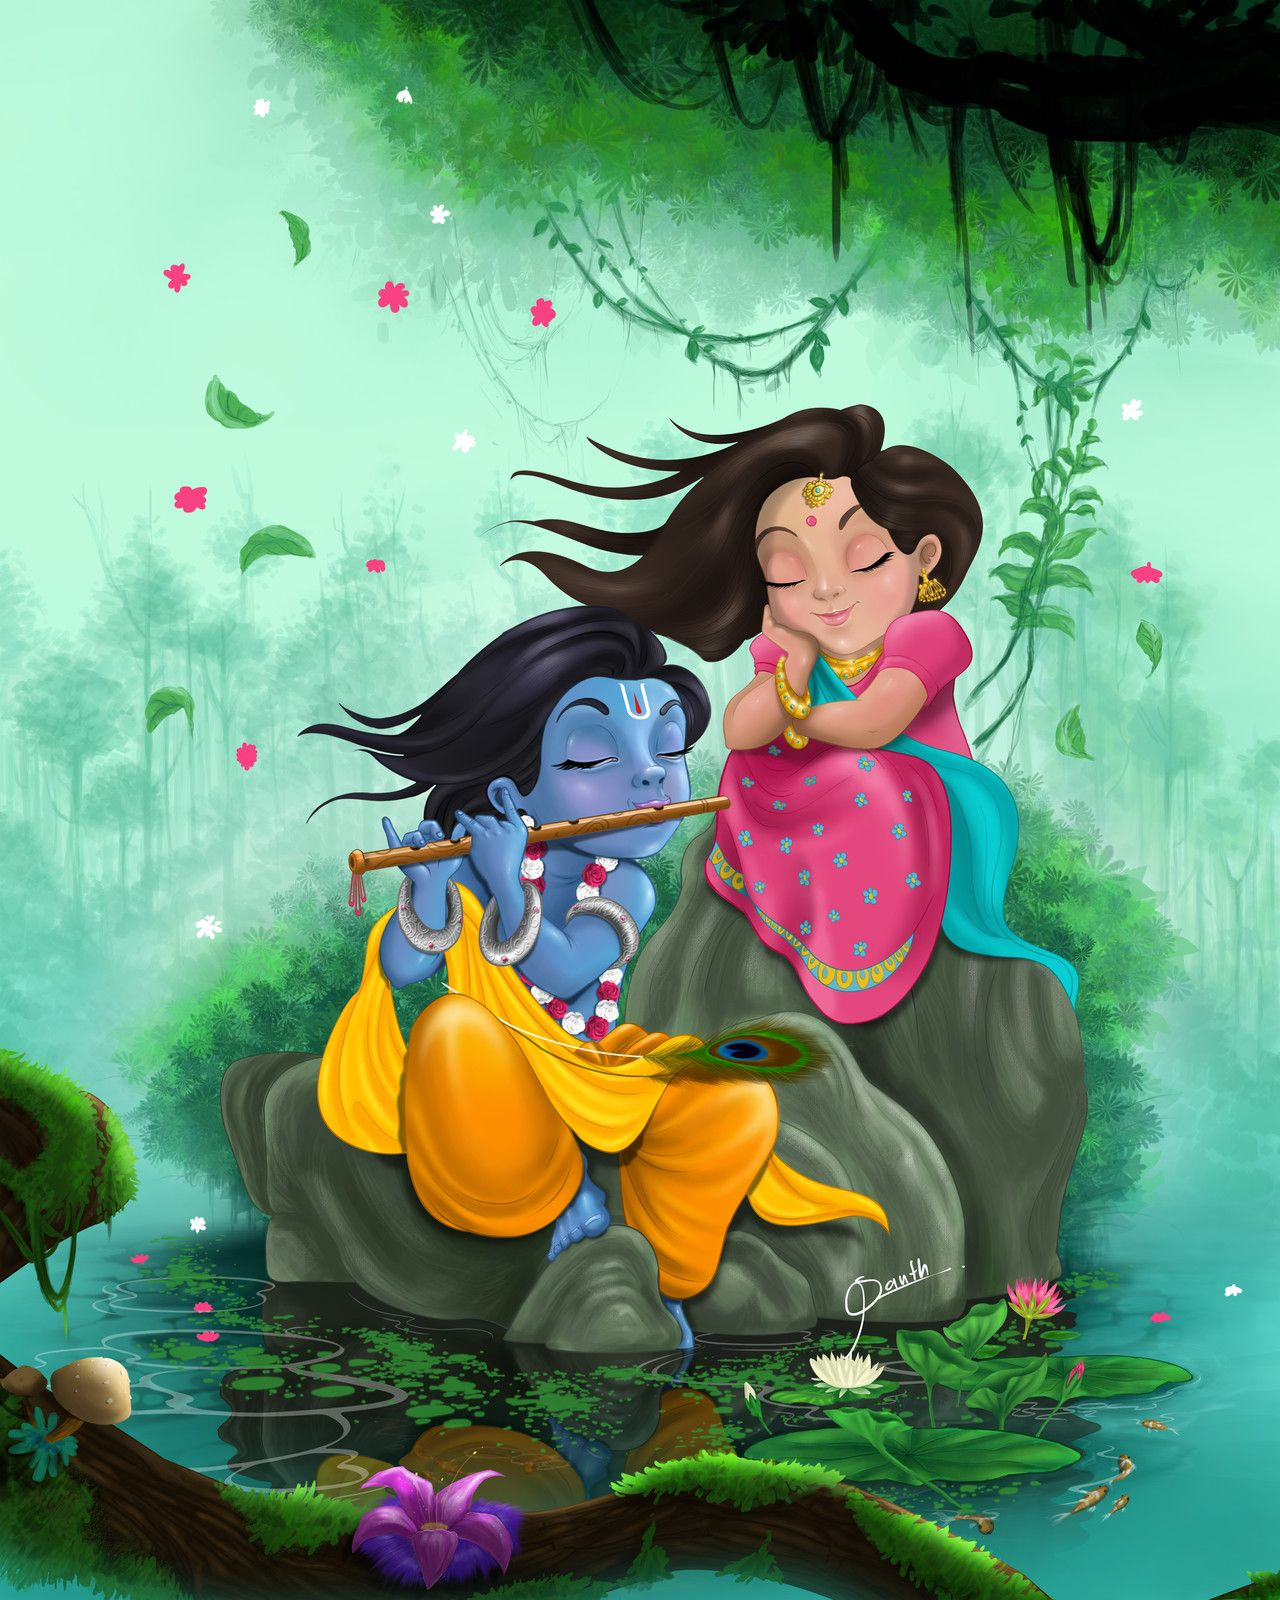 Radha Krishna #1, Santh Thapa On ArtStation At Https://www